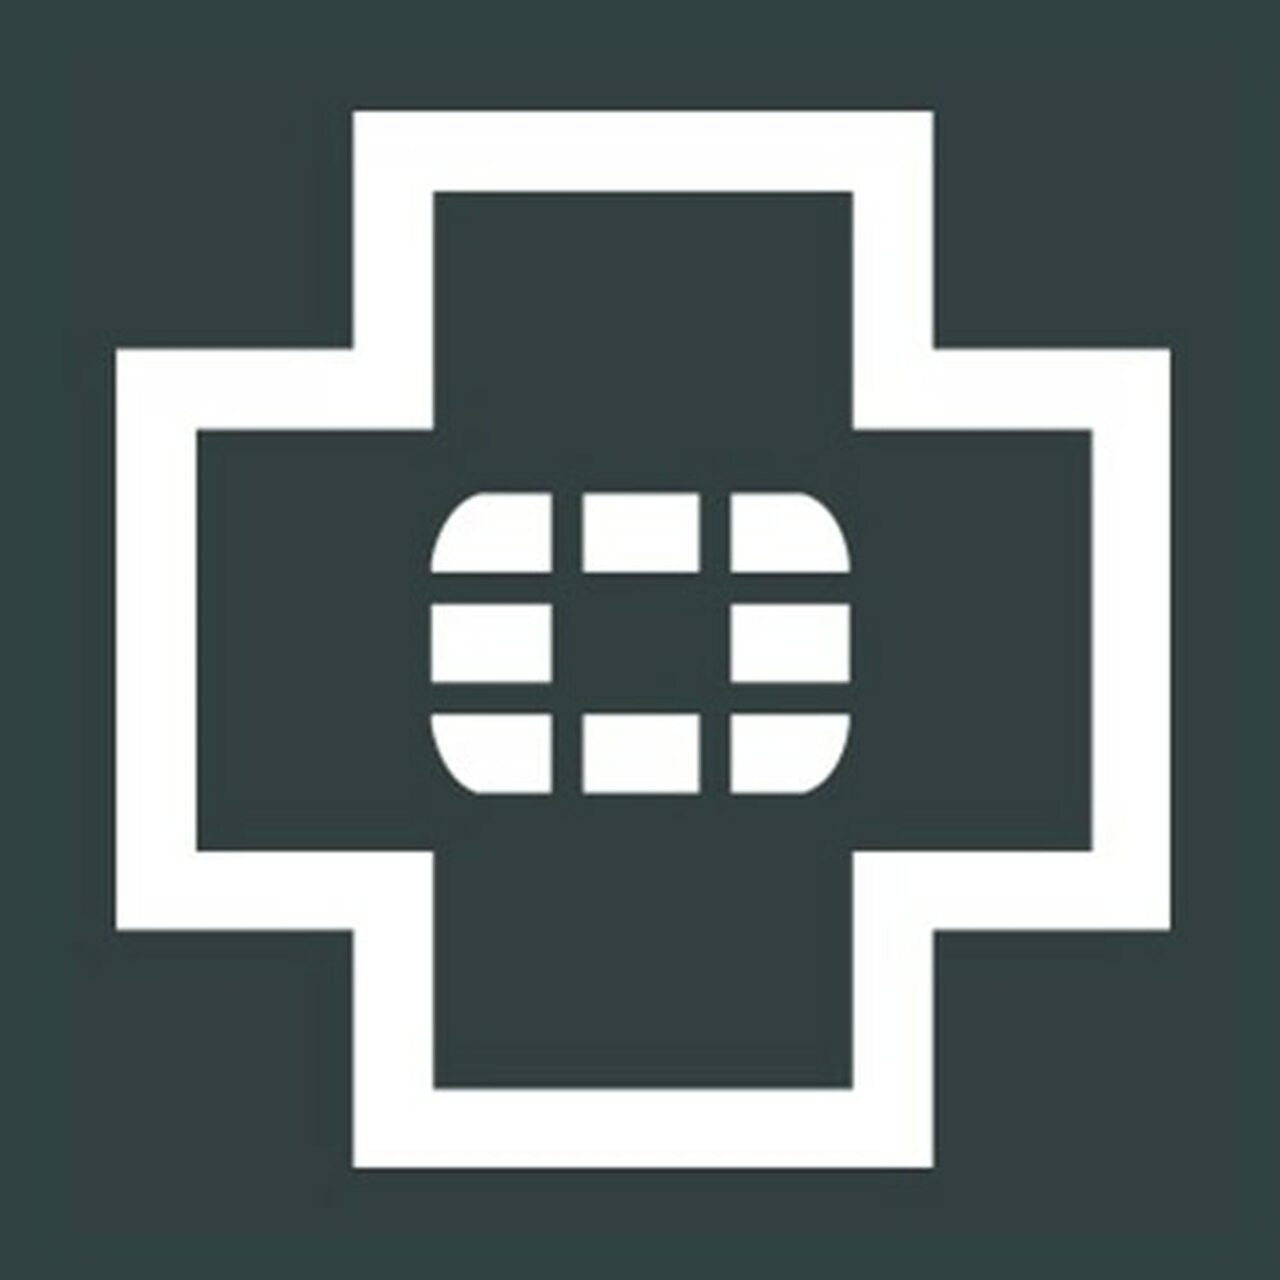 FortiGate-301E - 8x5 FortiCare Contract - 60 months